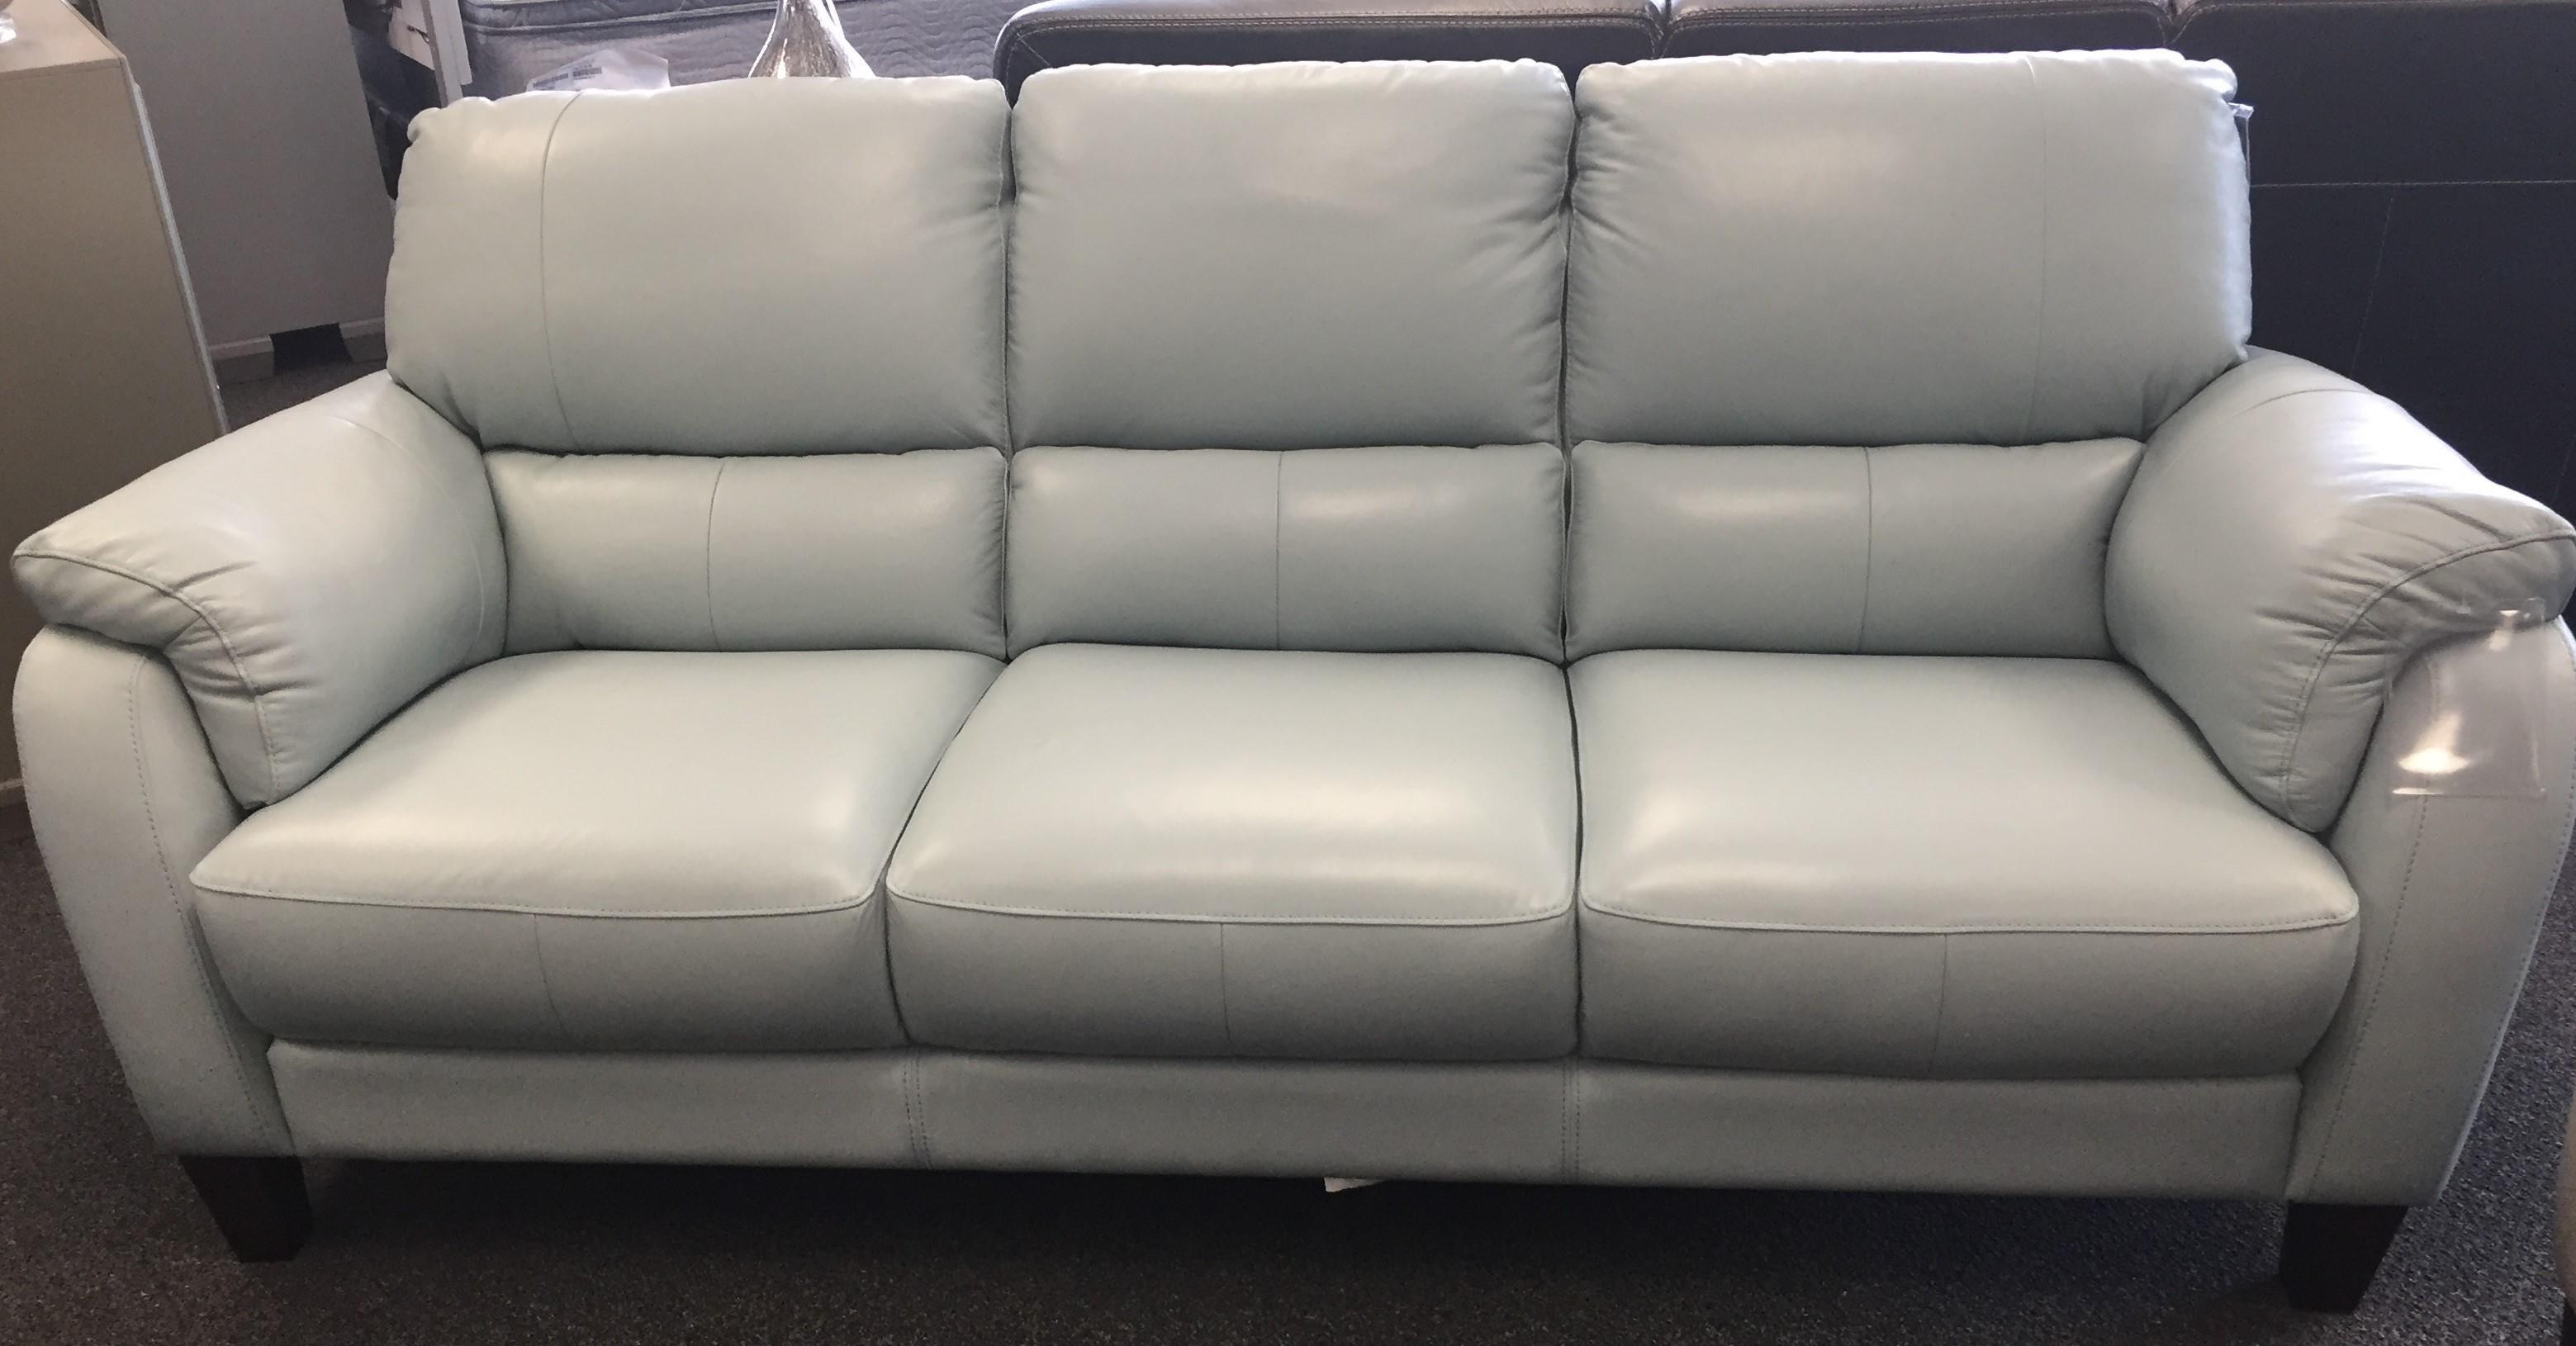 31933 Egg Blue Leather Sofa by Violino at Furniture Fair - North Carolina